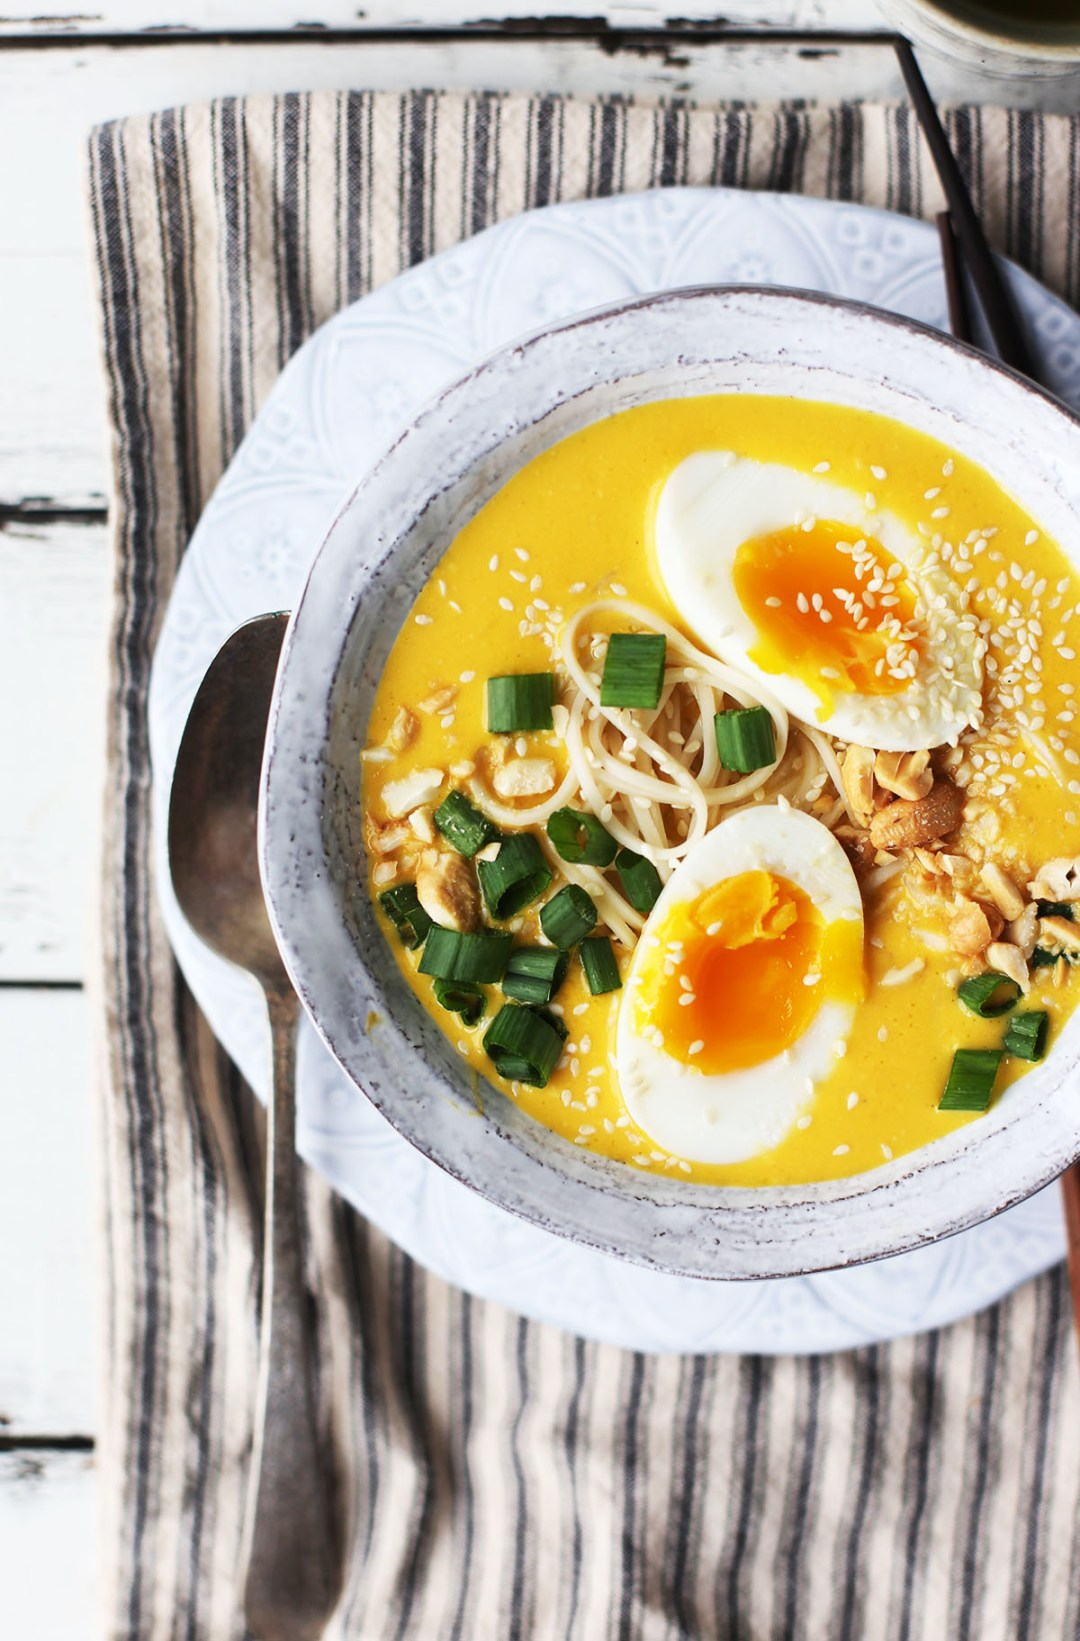 Crockpot Carrot Ginger Cashew Ramen Noodle Soup